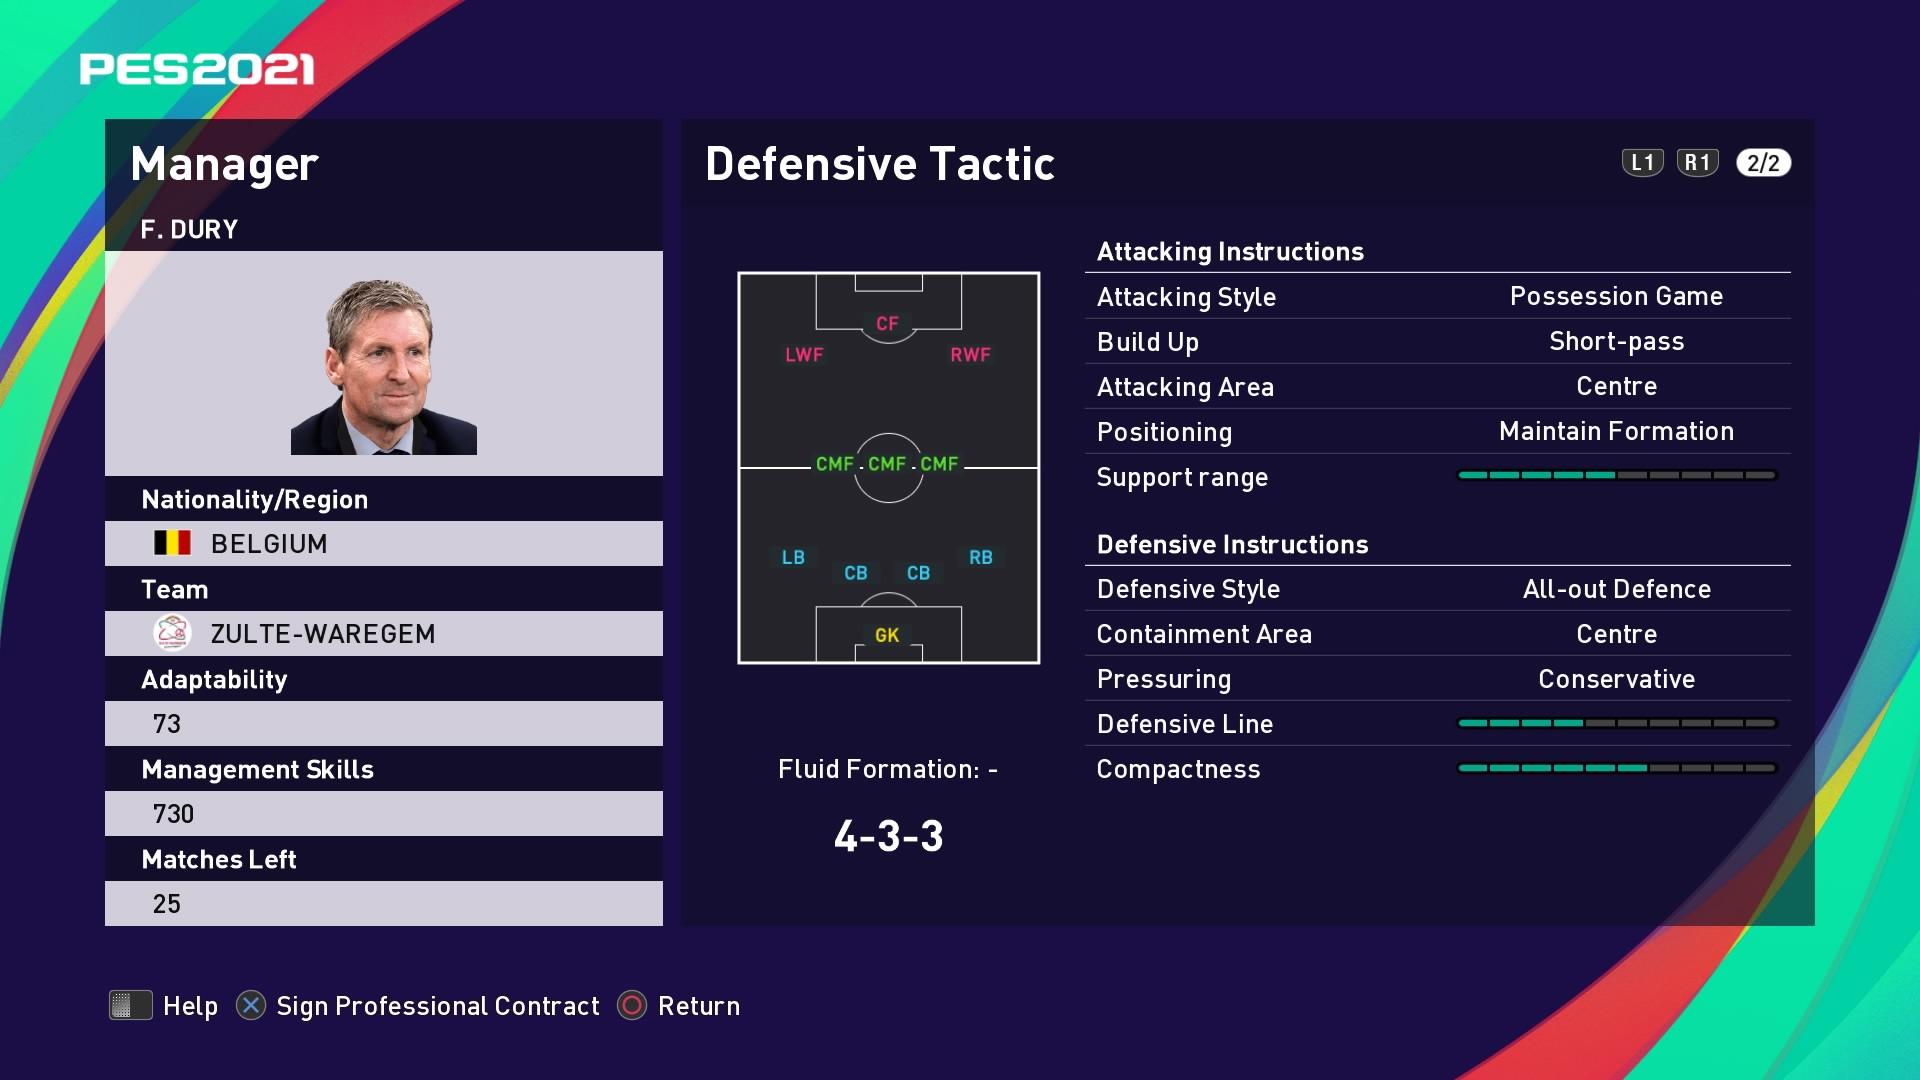 F. Dury (Francky Dury) Defensive Tactic in PES 2021 myClub